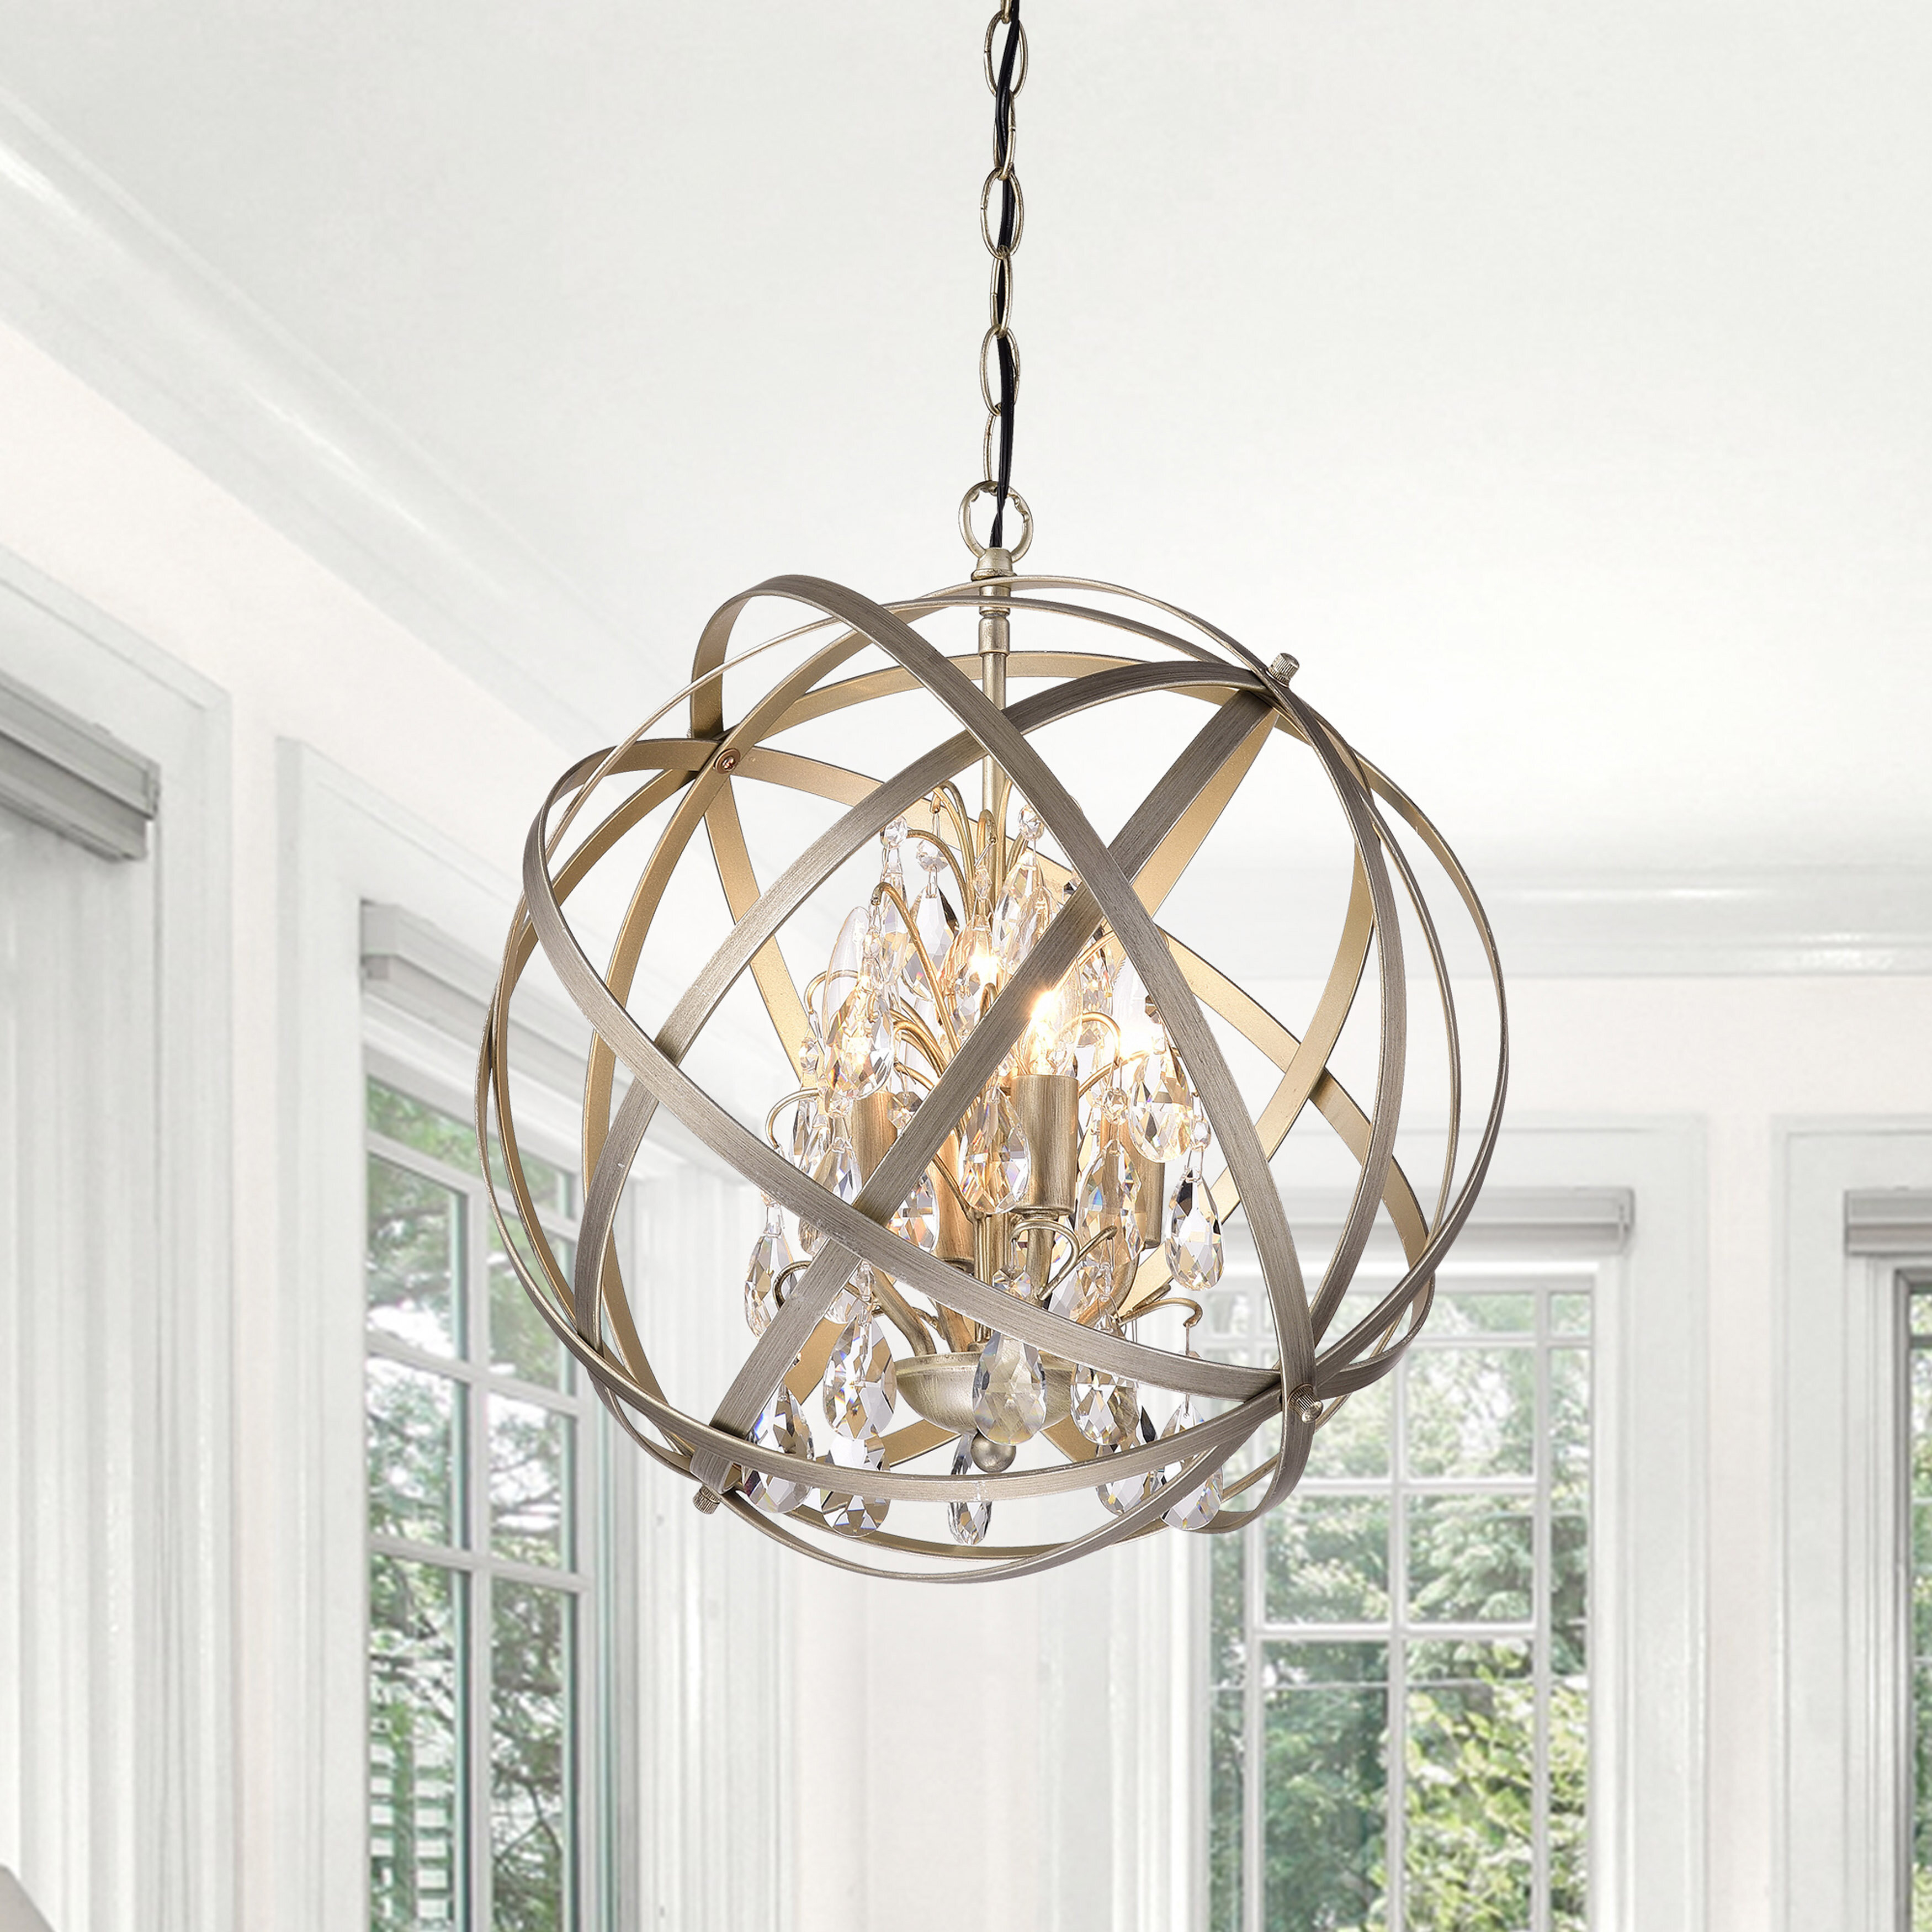 Willa Arlo Interiors Dalveen 4 Light Globe Chandelier With Regard To Adcock 3 Light Single Globe Pendants (View 13 of 30)